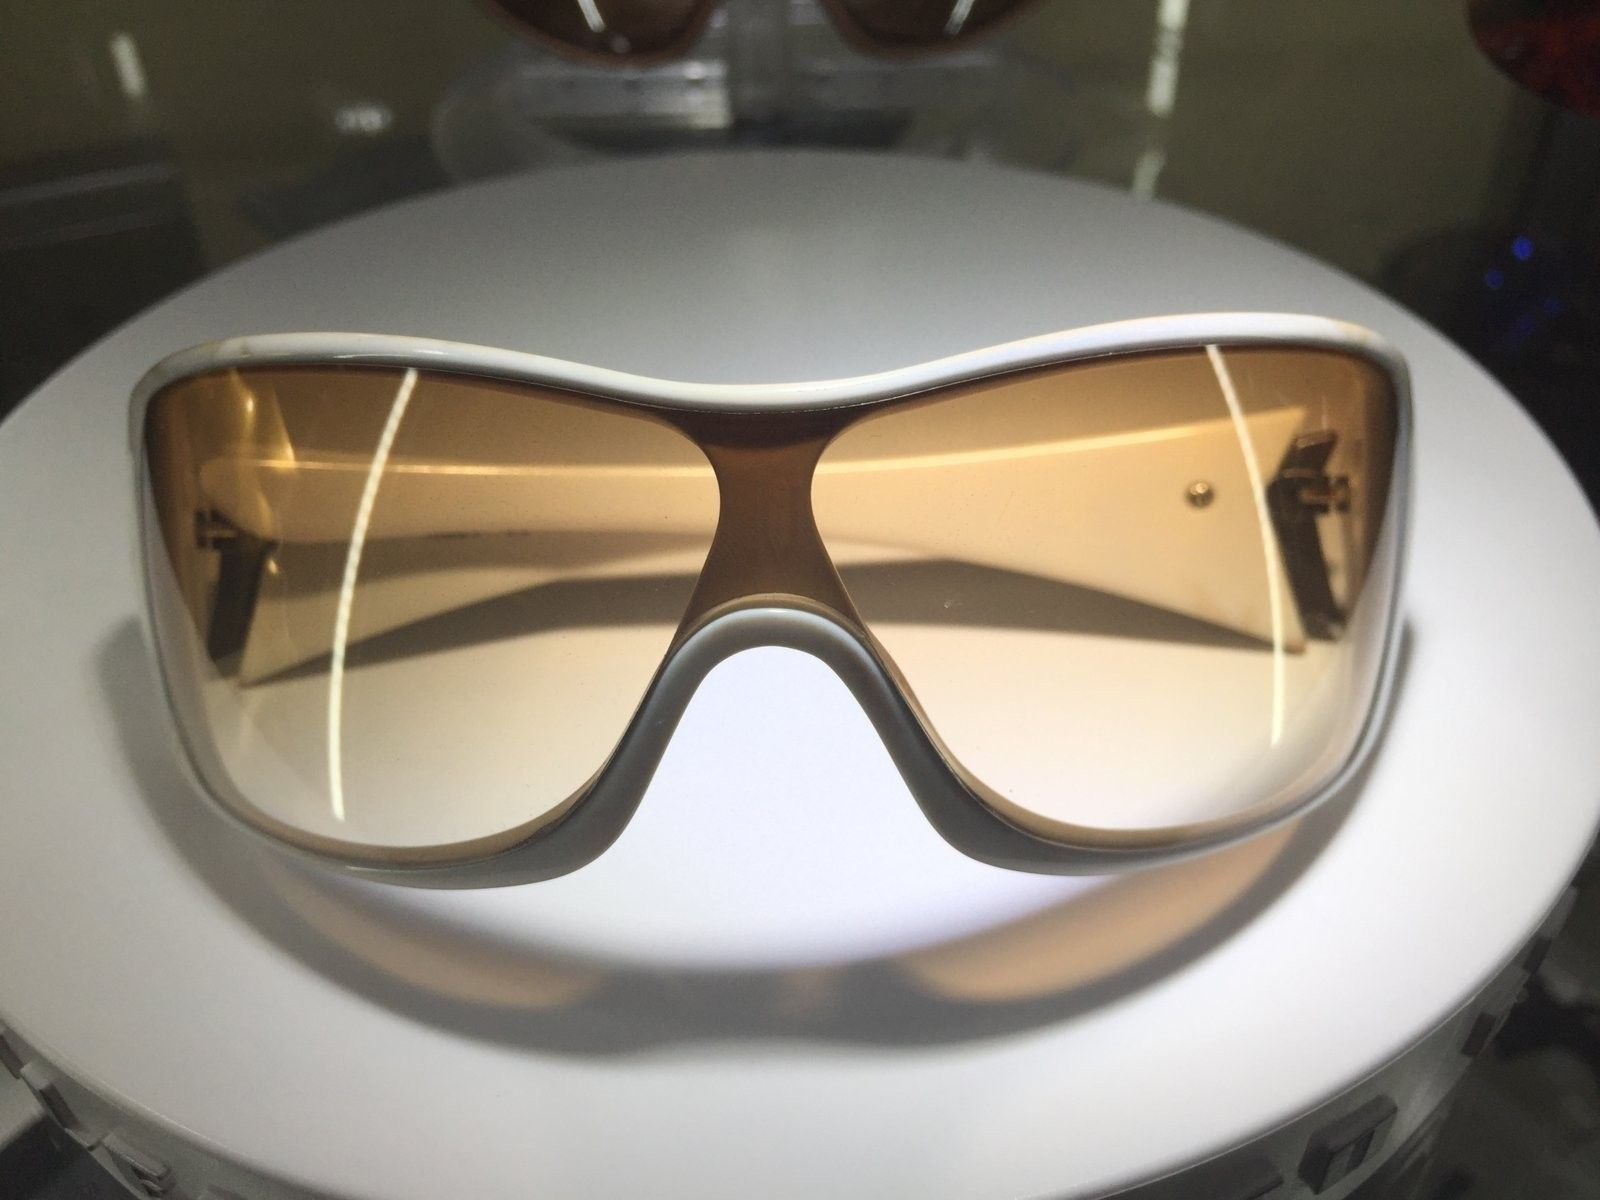 Riddle Polished White w/ Brown gradients SKU: 05-905 + 3 lenses $150 - image.jpeg